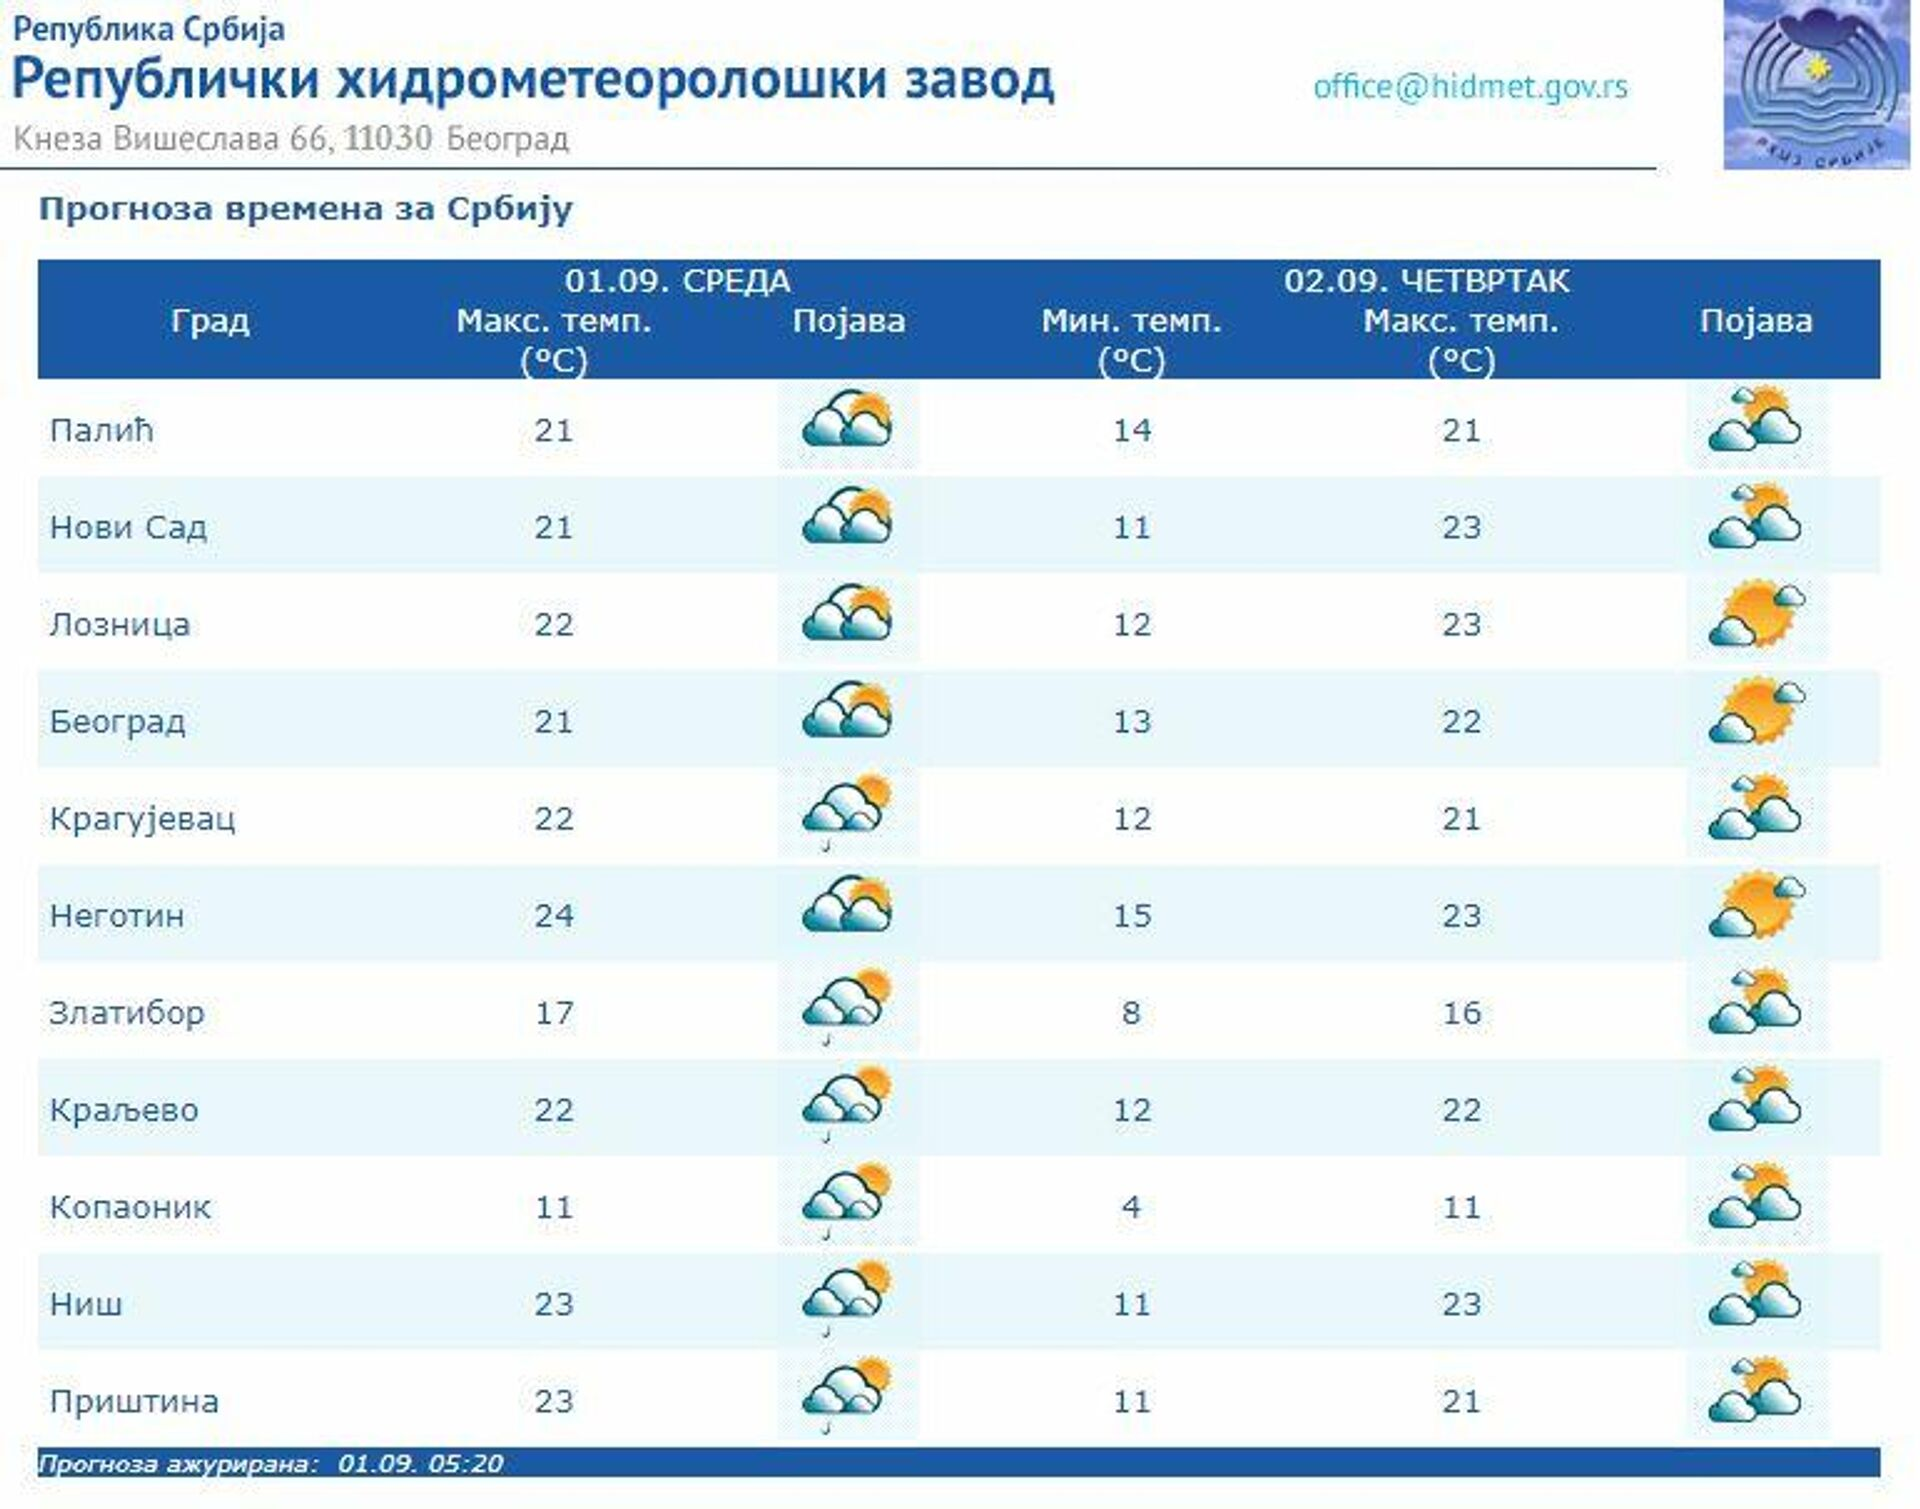 Vremenska prognoza za 1. septembar 2021. - Sputnik Srbija, 1920, 01.09.2021